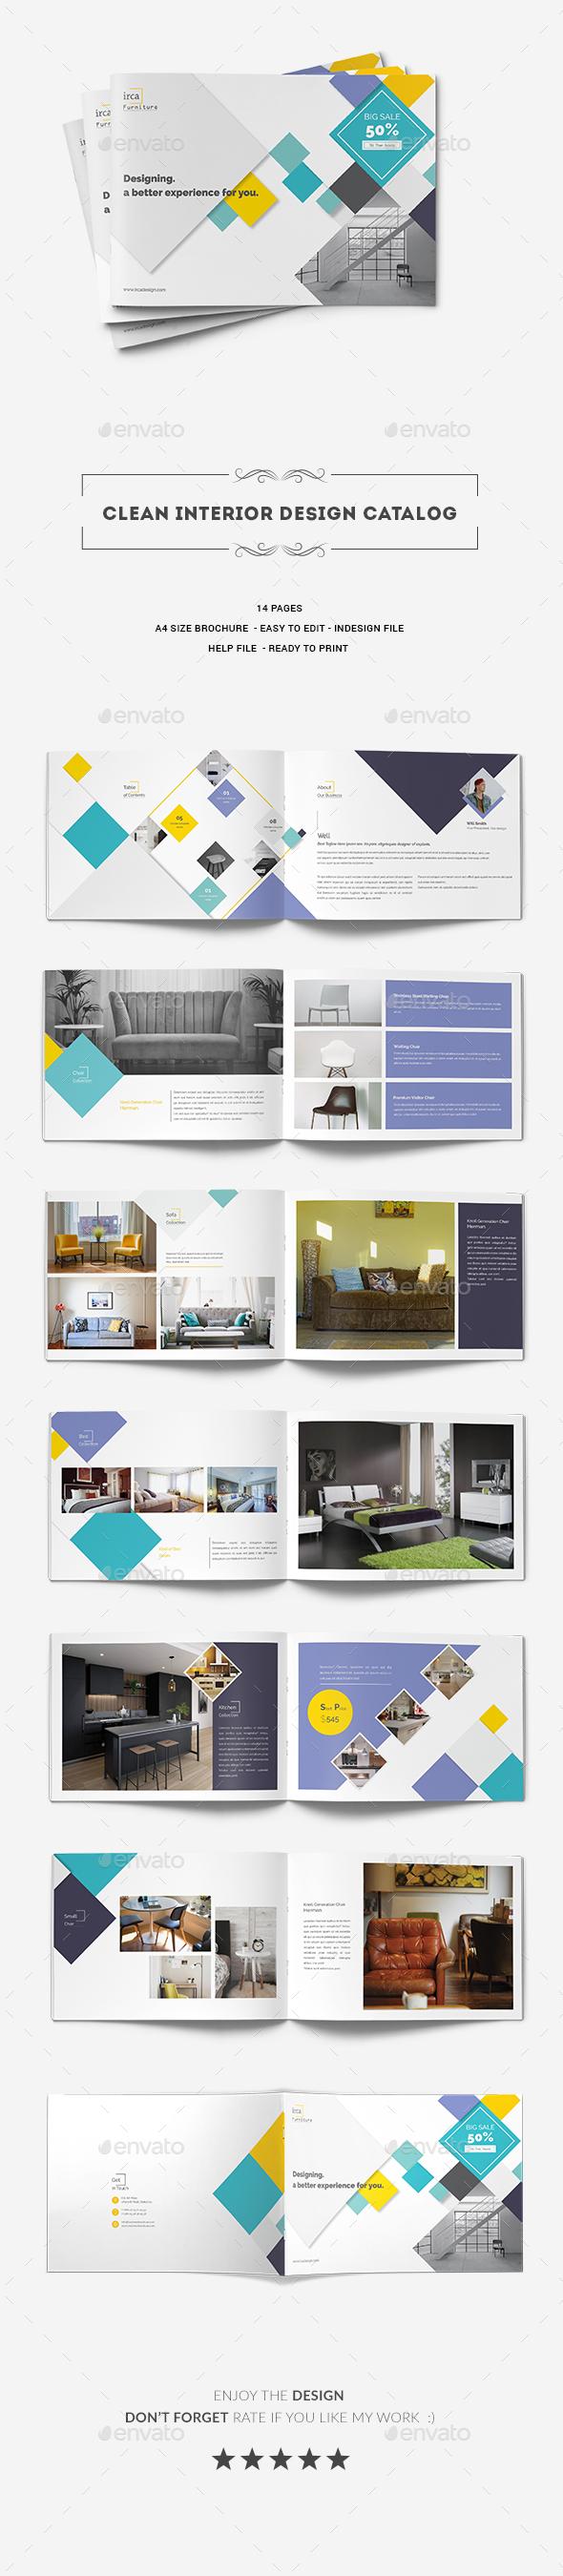 Clean Interior Design Catalog - Catalogs Brochures